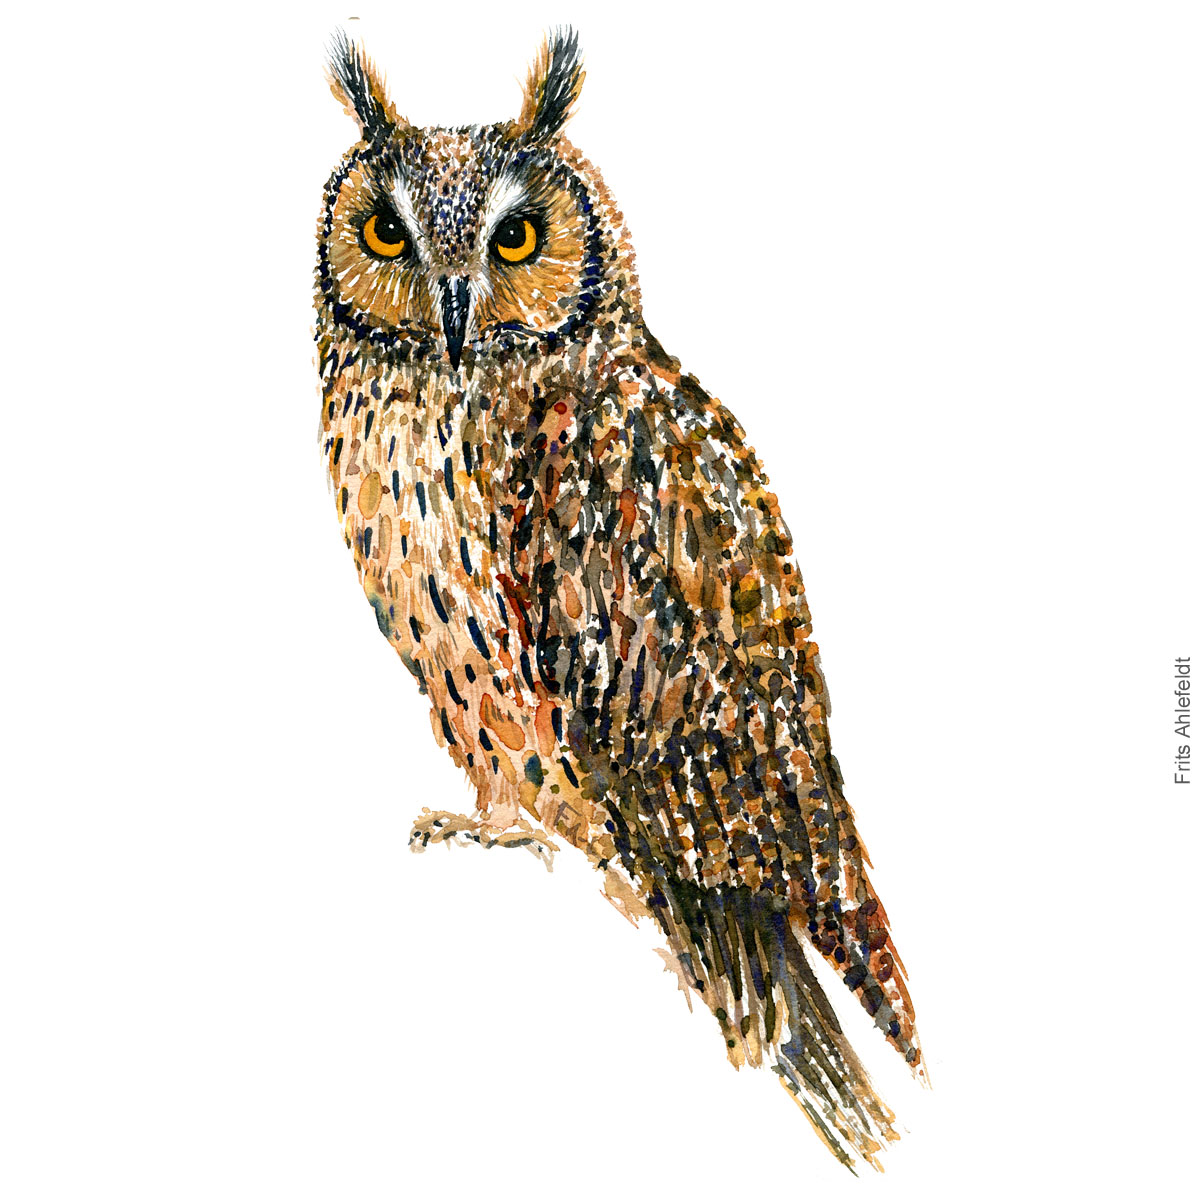 Long eared owl - Skovhornsugle Akvarel. Watercolor bird illustration by Frits Ahlefeldt